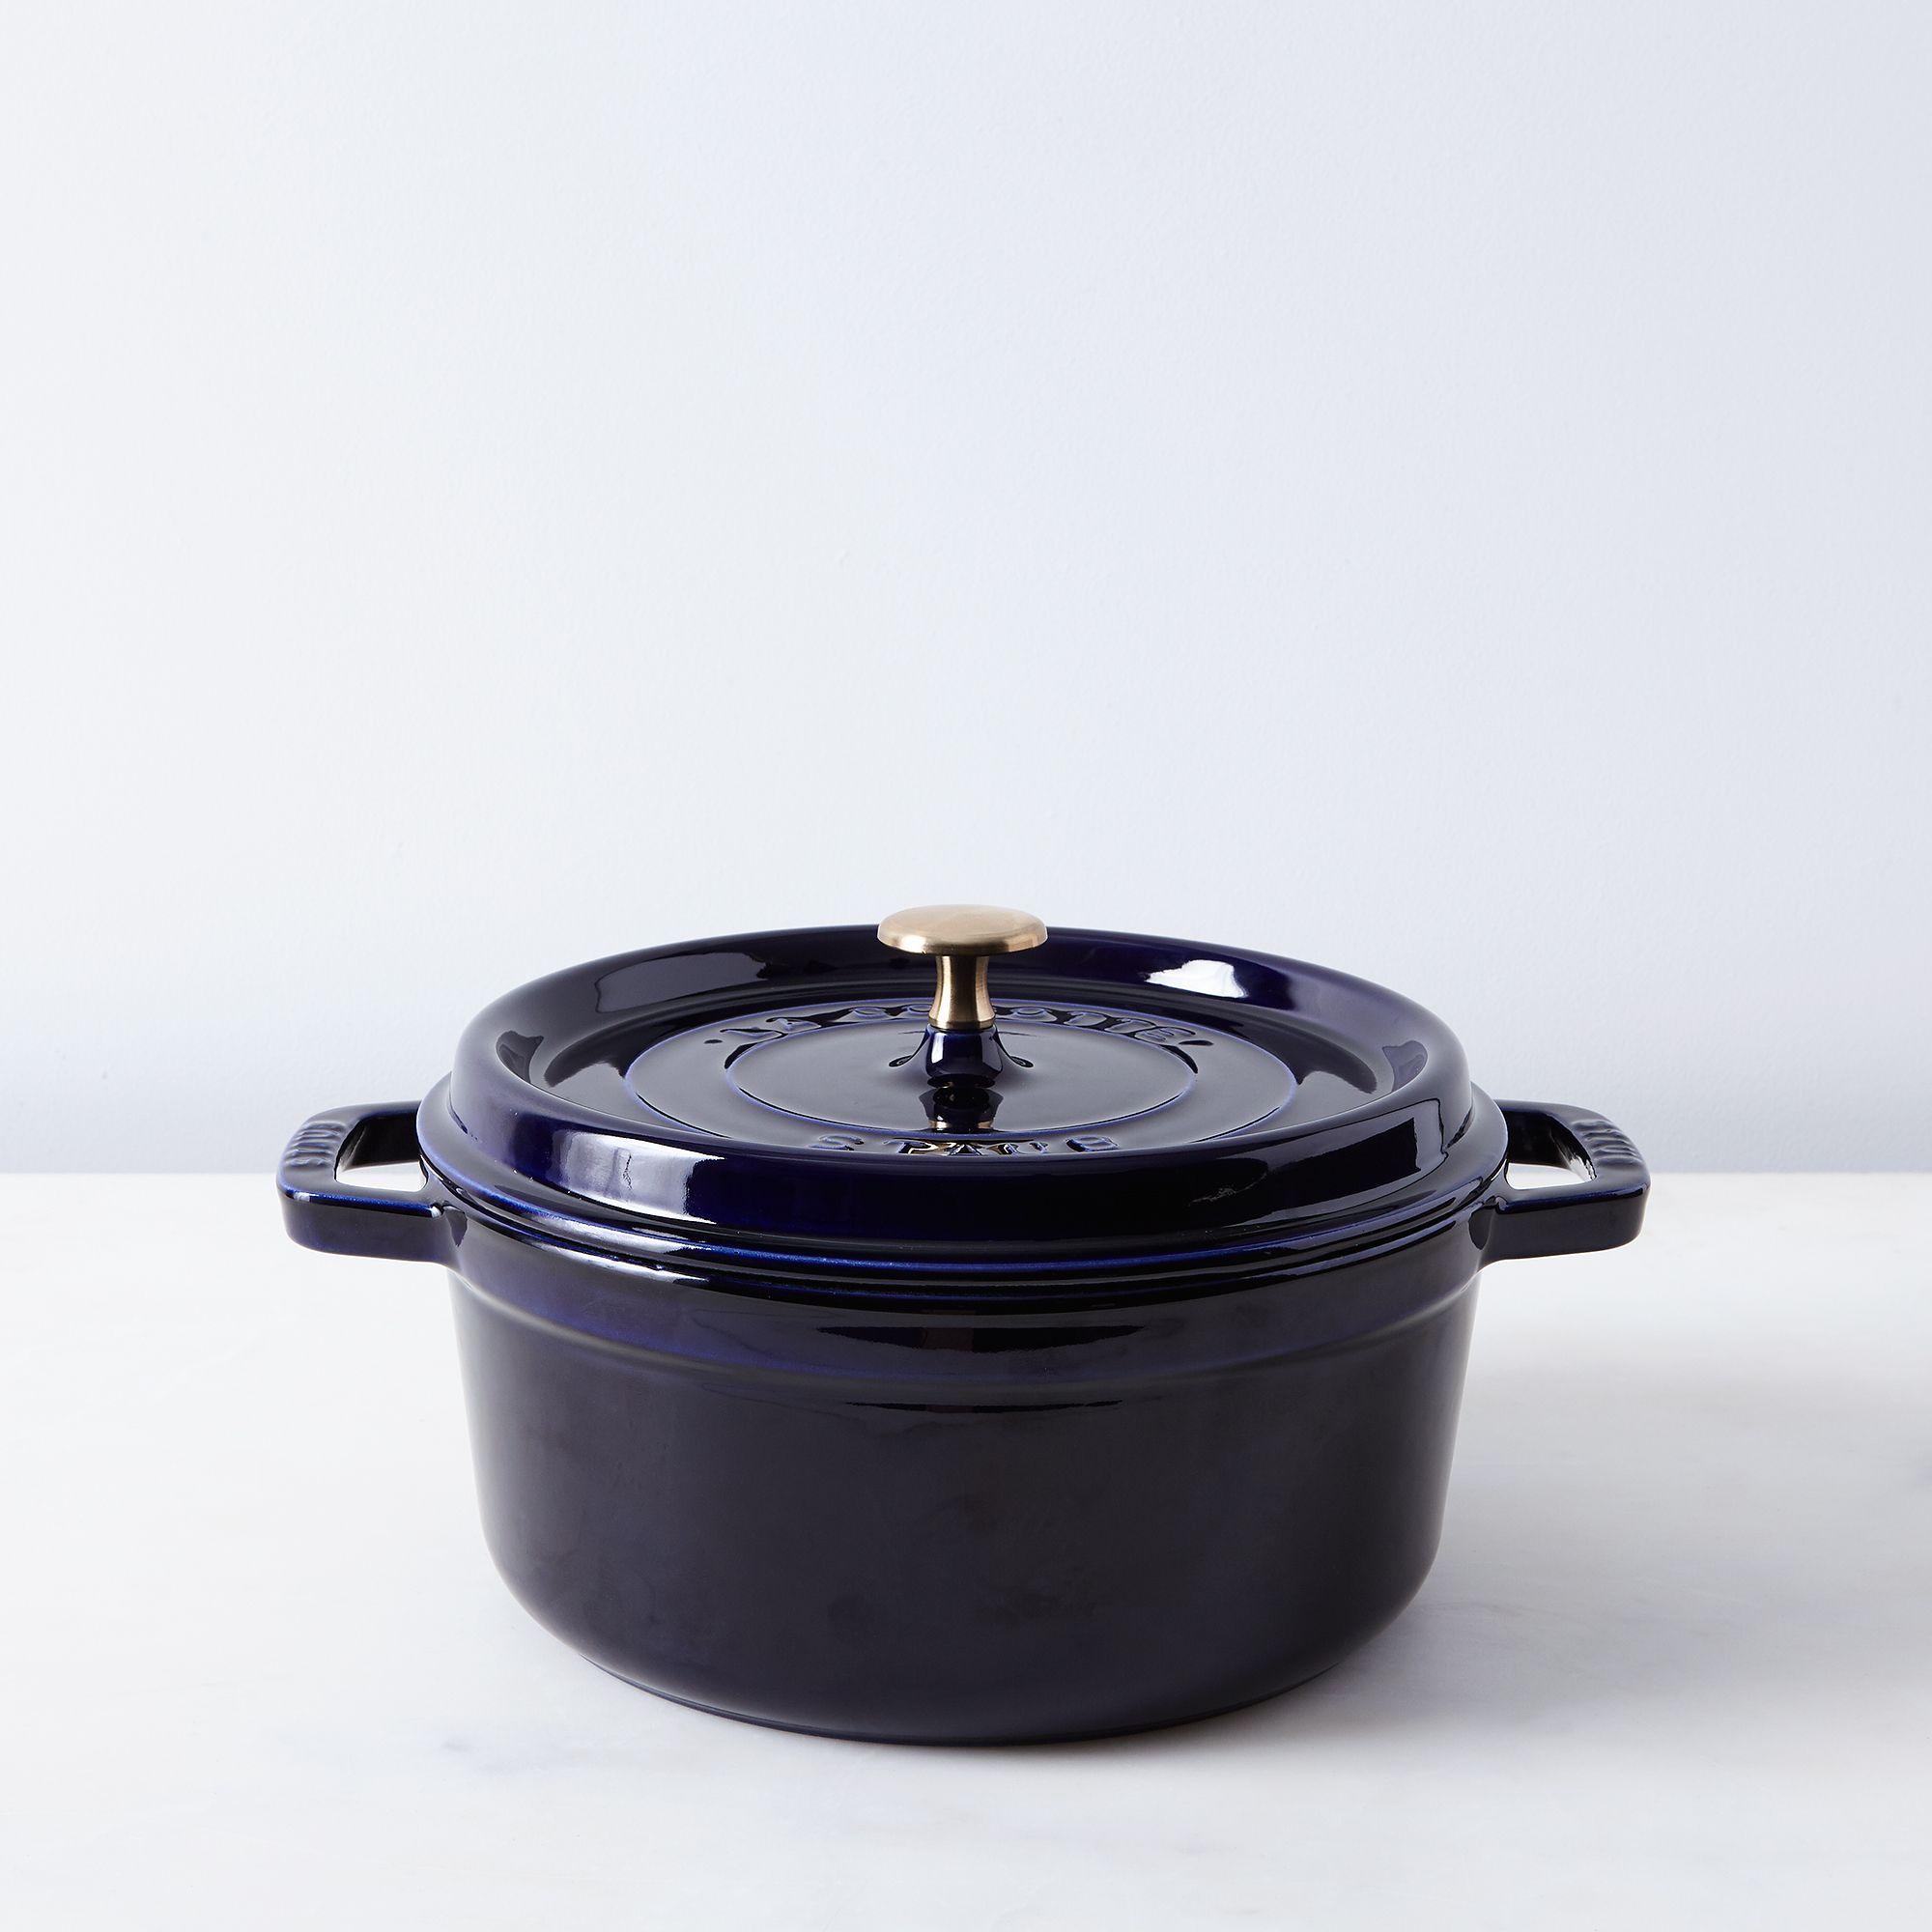 Food52 x Staub Round Cocotte - 4QT